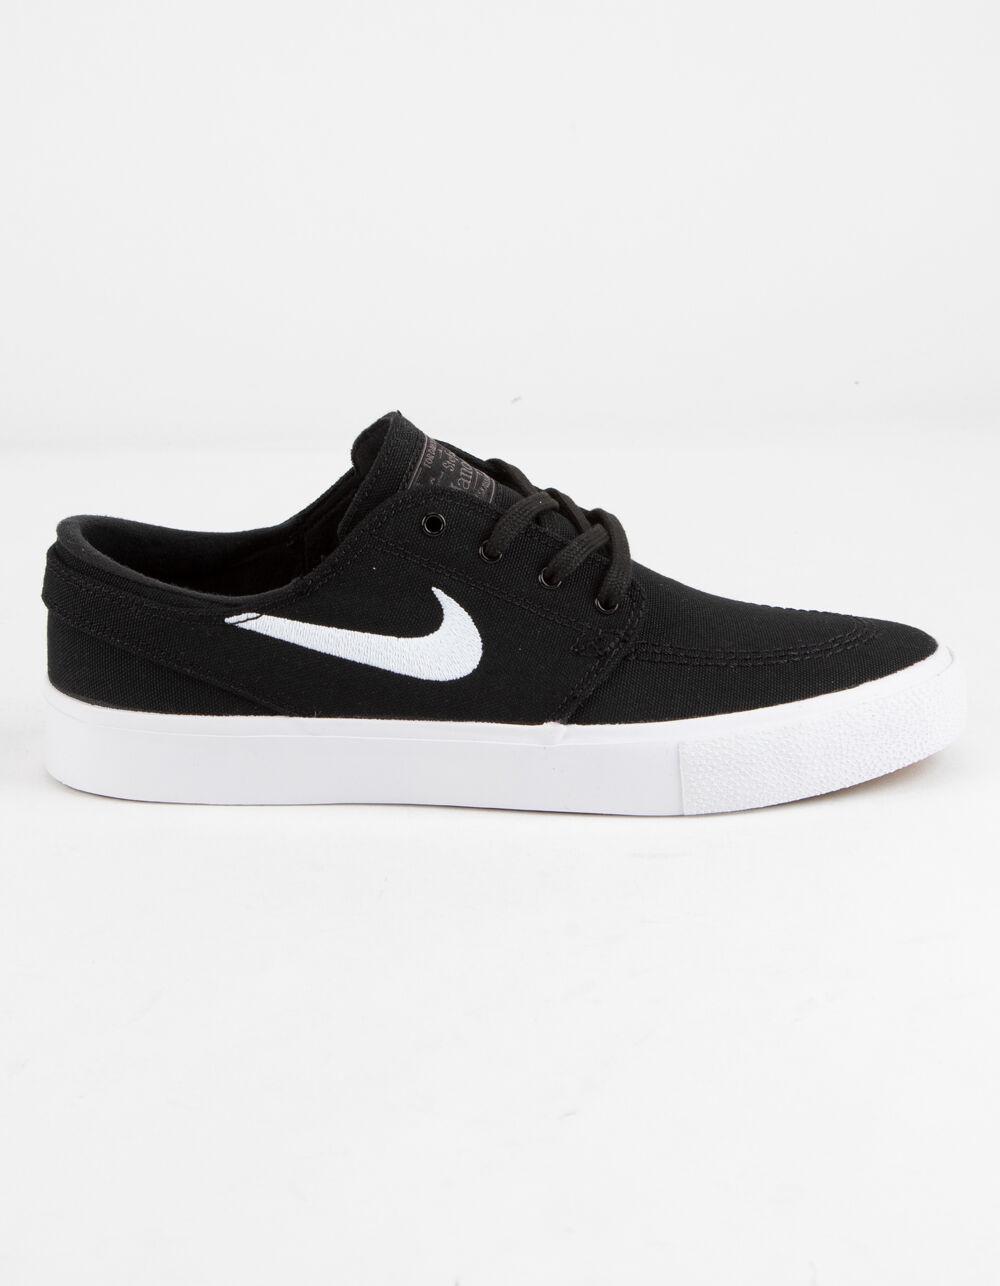 NIKE SB Zoom Janoski Canvas RM Black & White Shoes